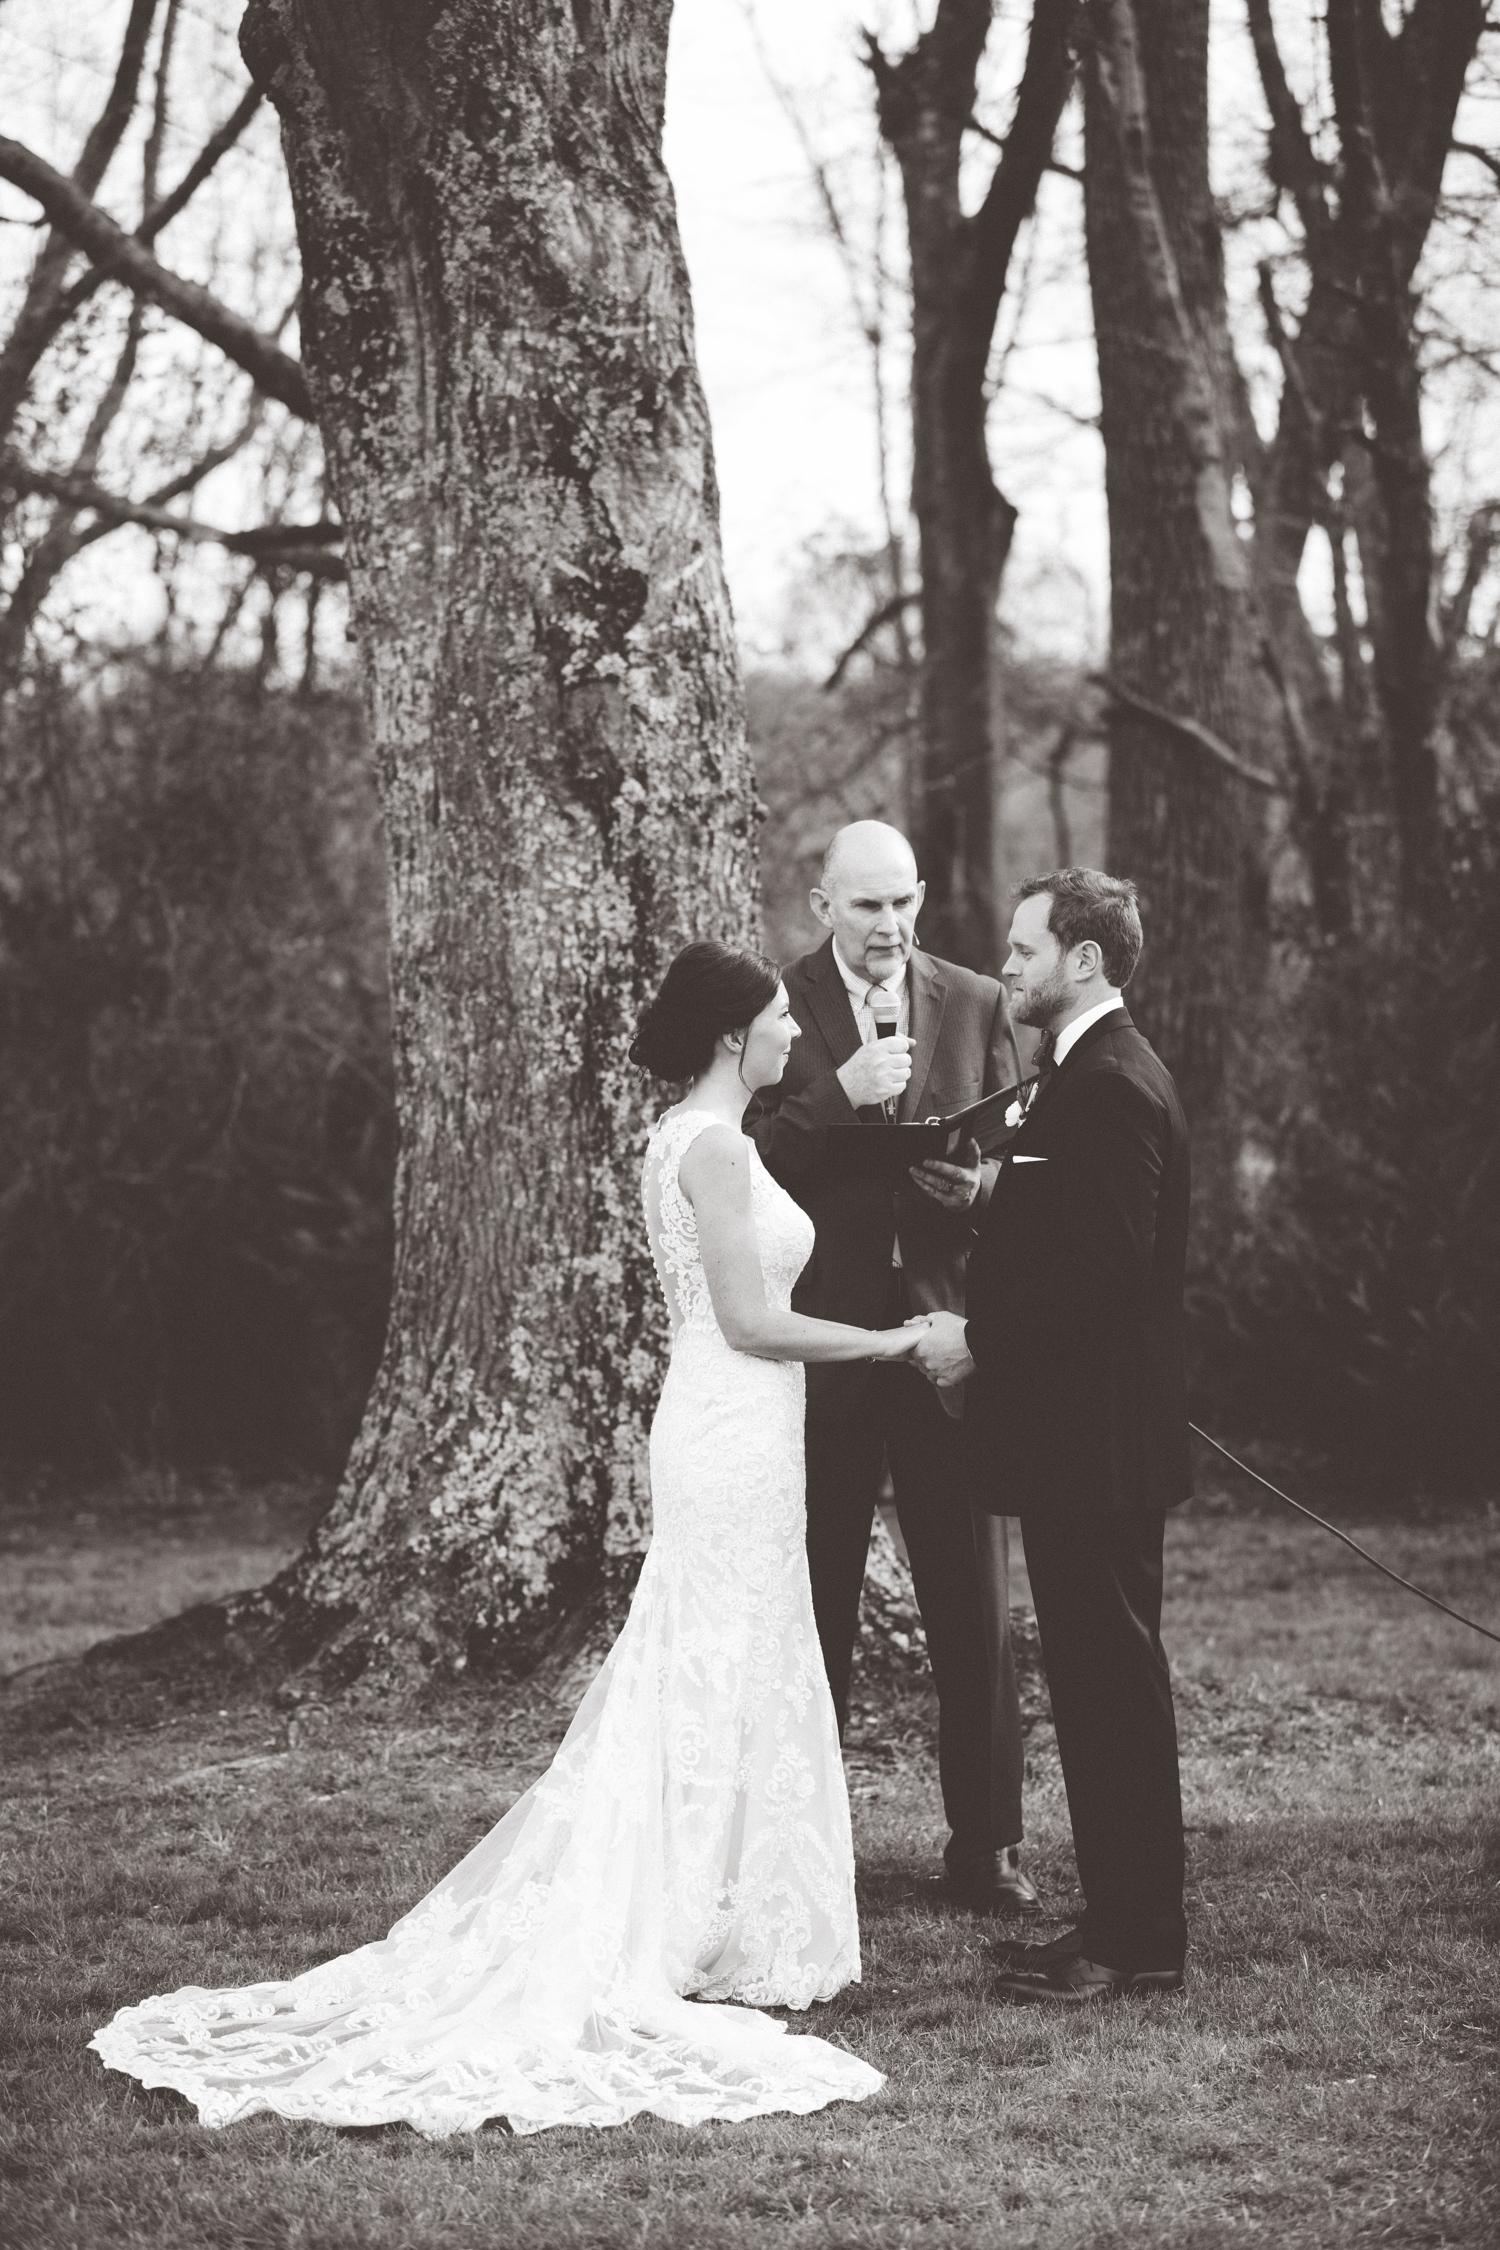 KDP_lindsey&taylor_wedding-604.JPG